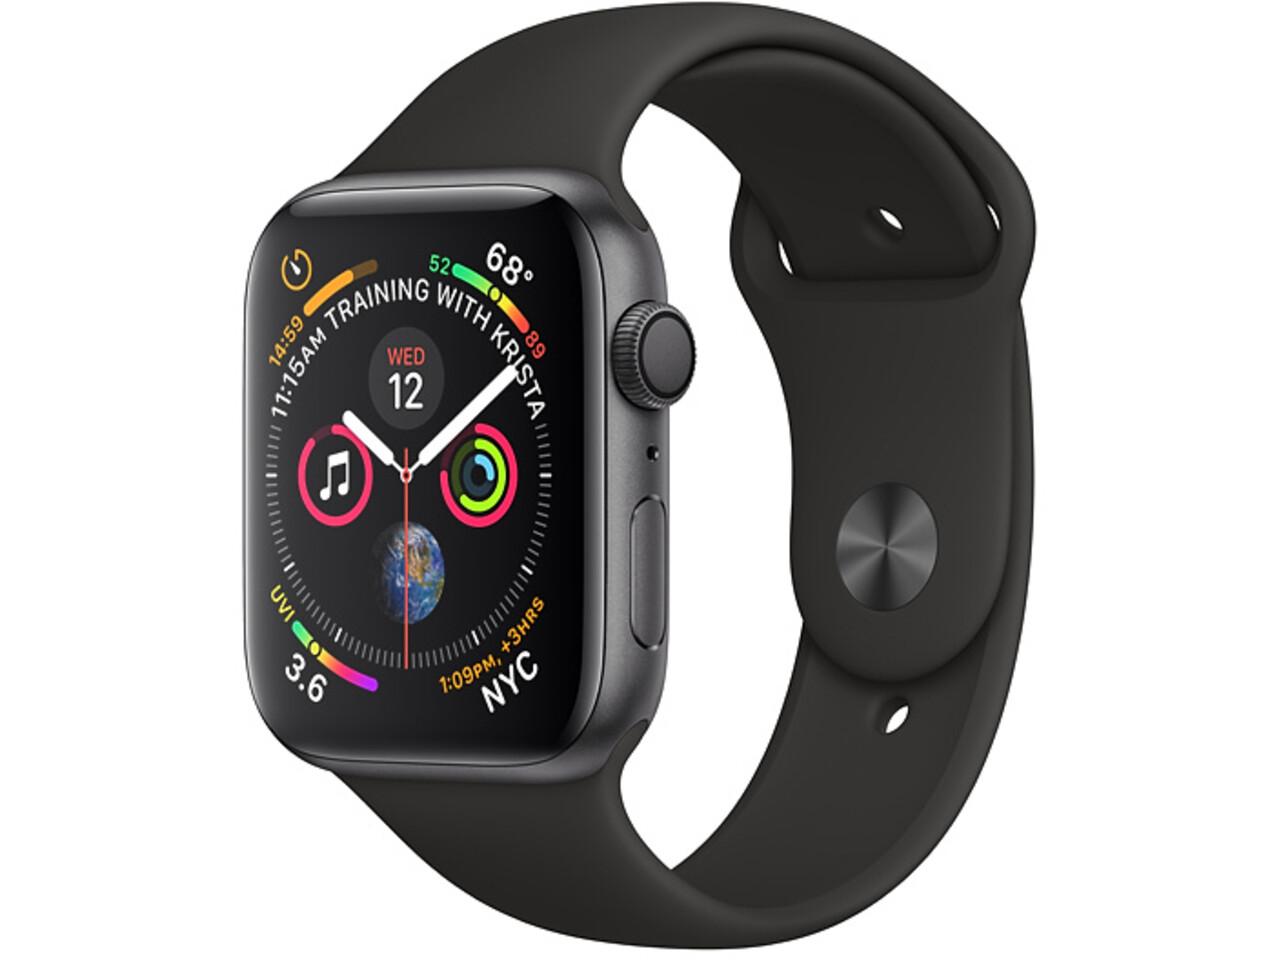 apple watch series 4 44mm space gray aluminum black sport band